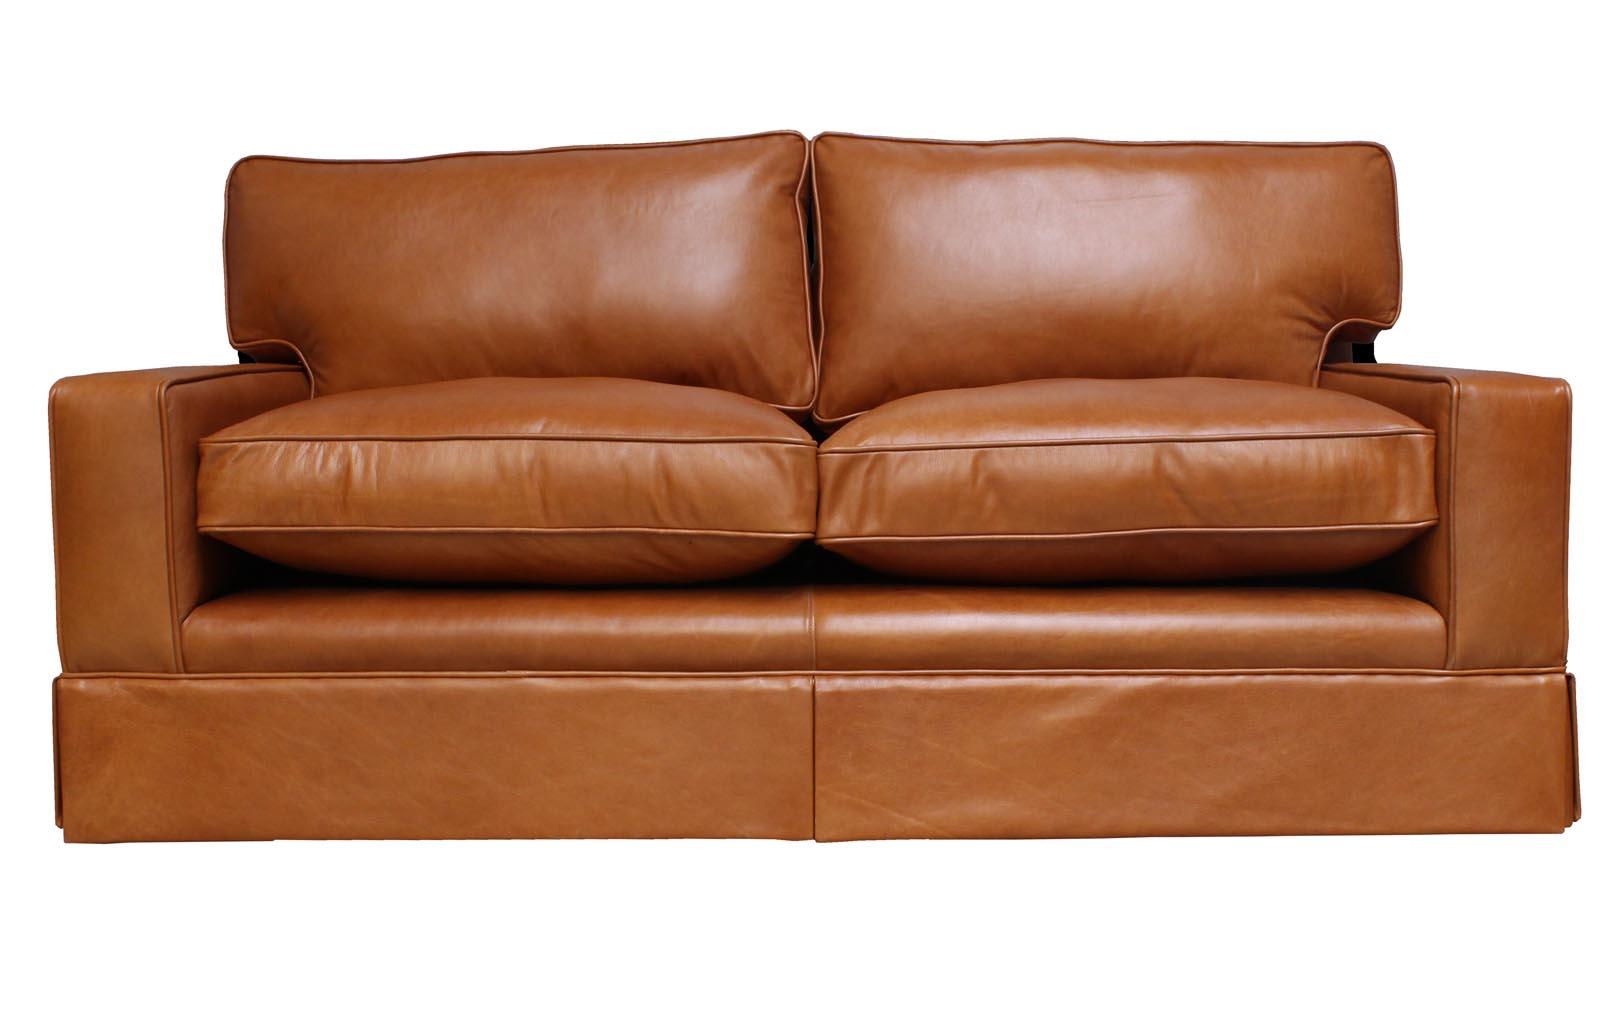 Fine Chelsea Leather Sofas Dailytribune Chair Design For Home Dailytribuneorg